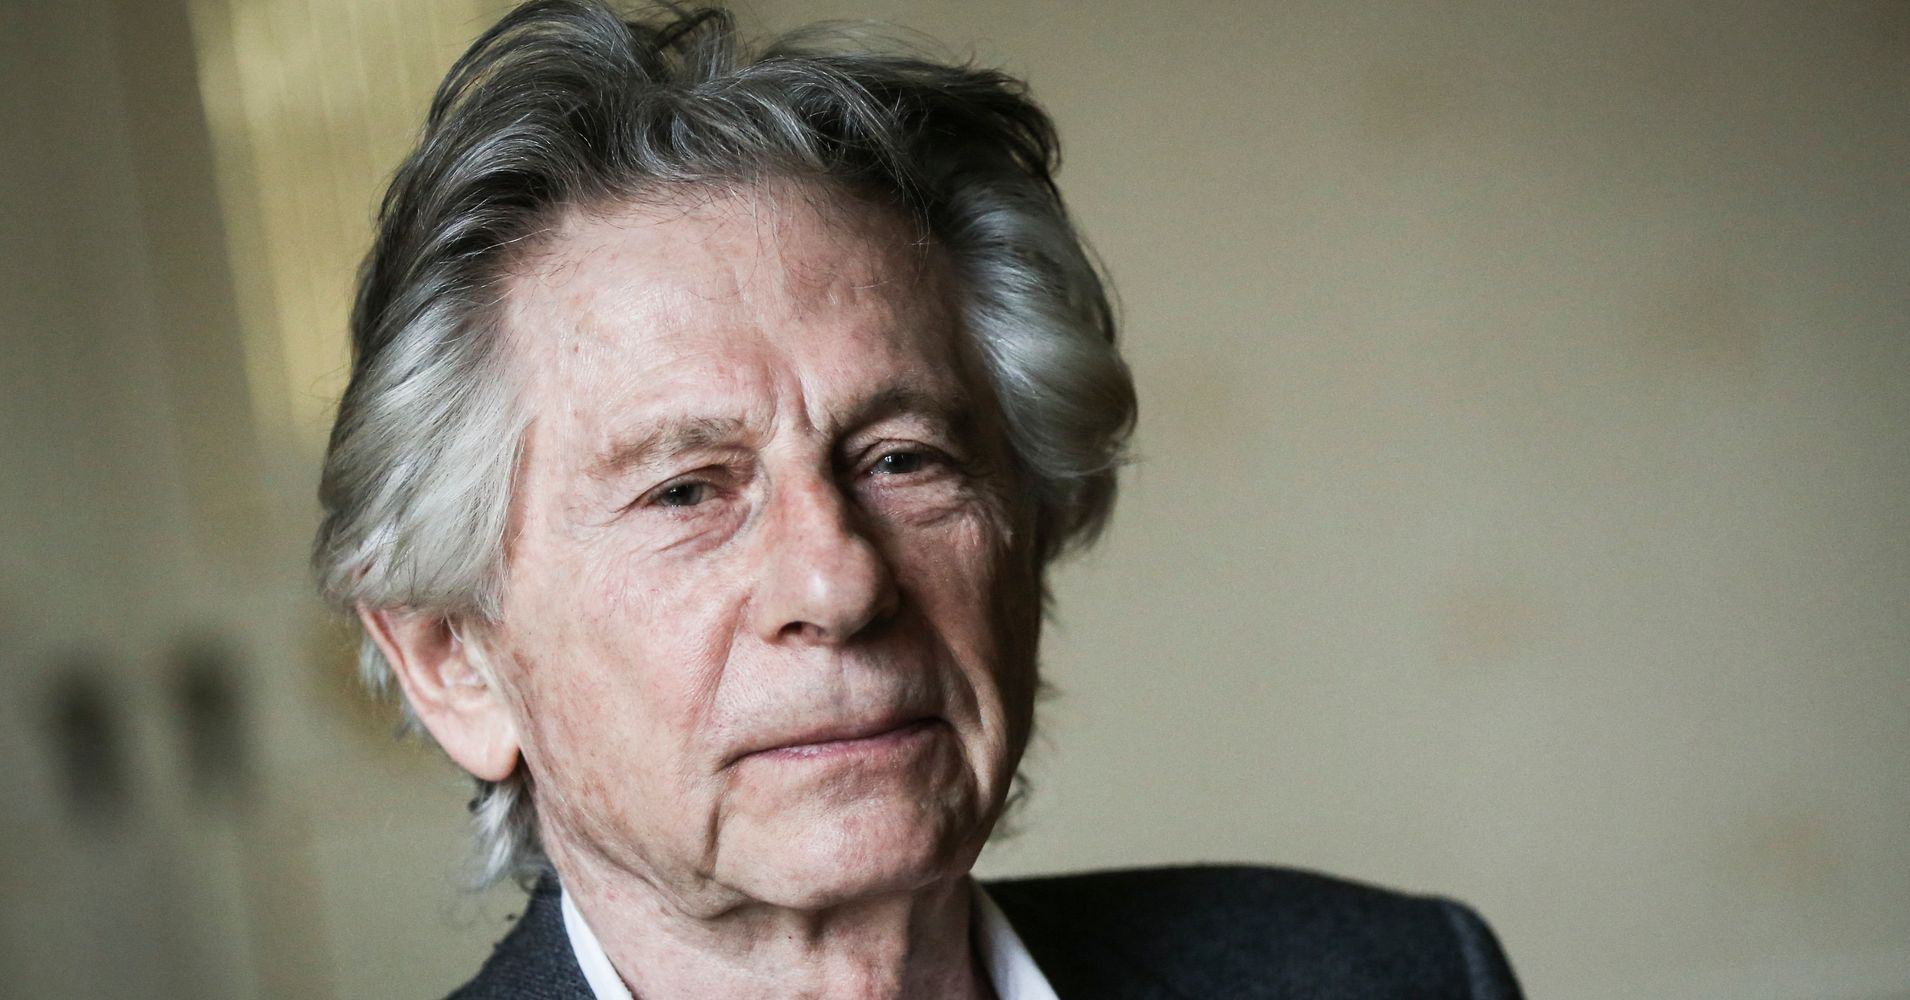 Child Sexual Predator Roman Polanski Calls Me Too Movement 'Total Hypocrisy'